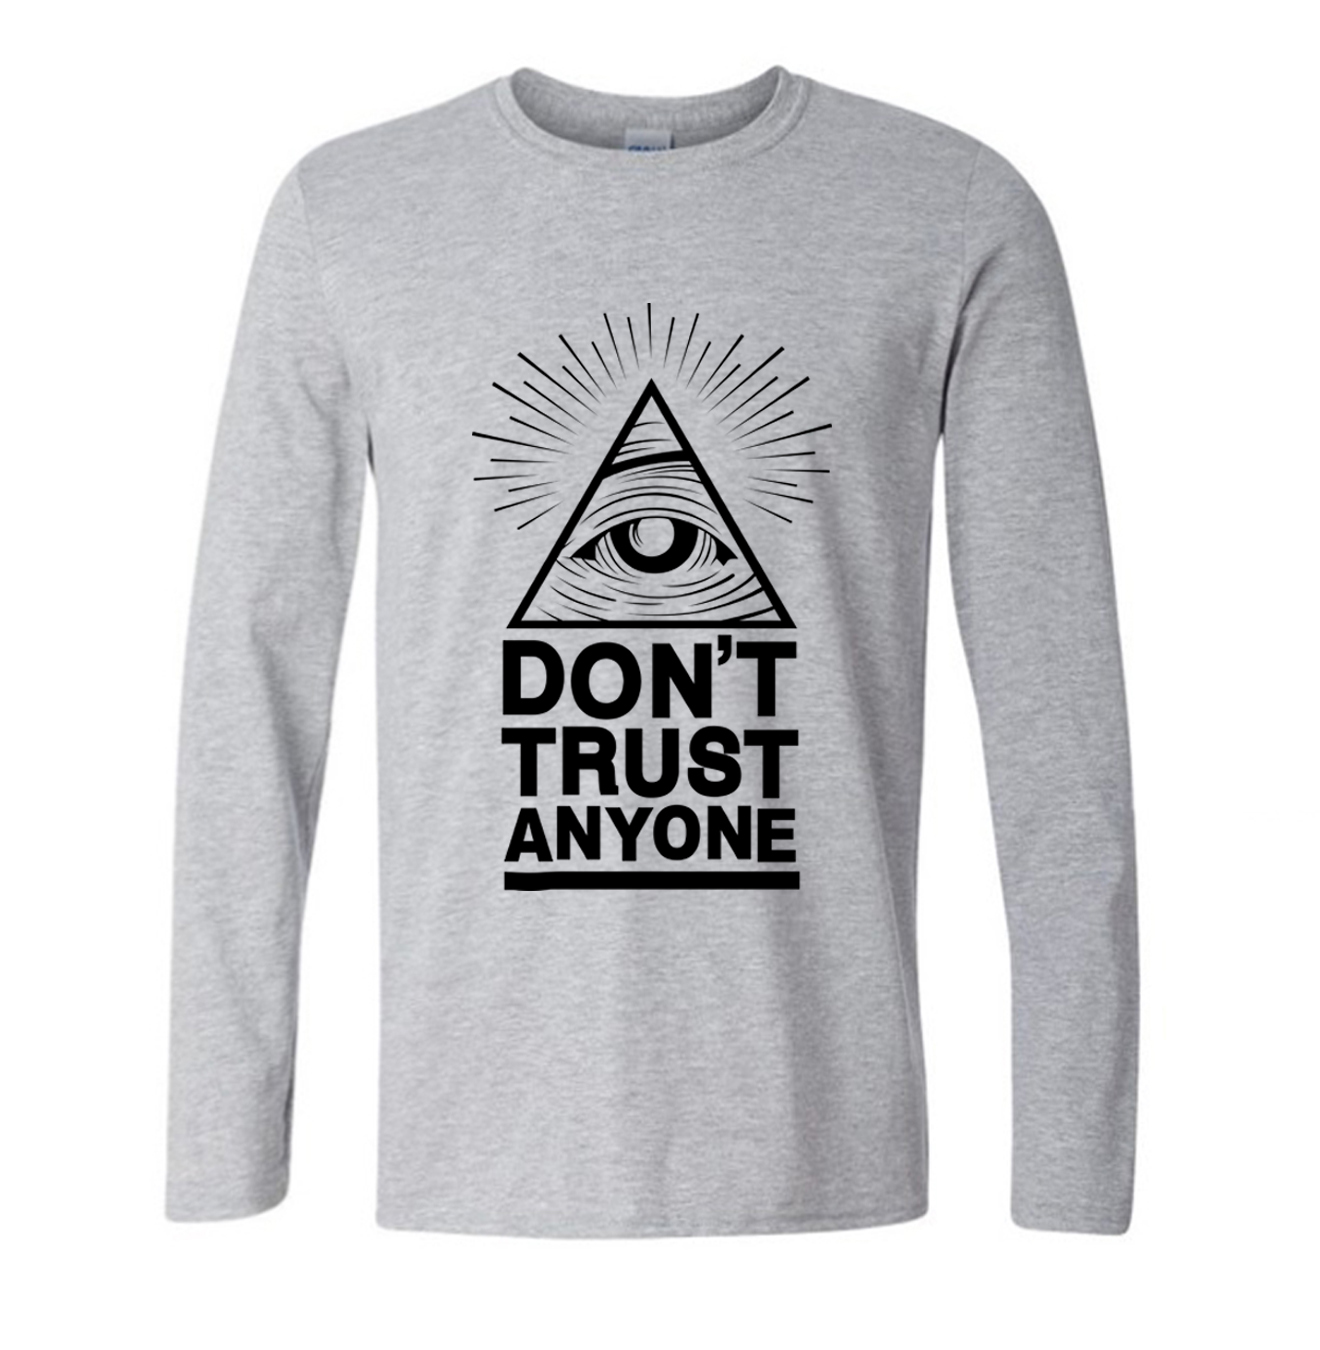 Dont trust anyone illuminati all seeing eye shirt custom for My custom t shirt